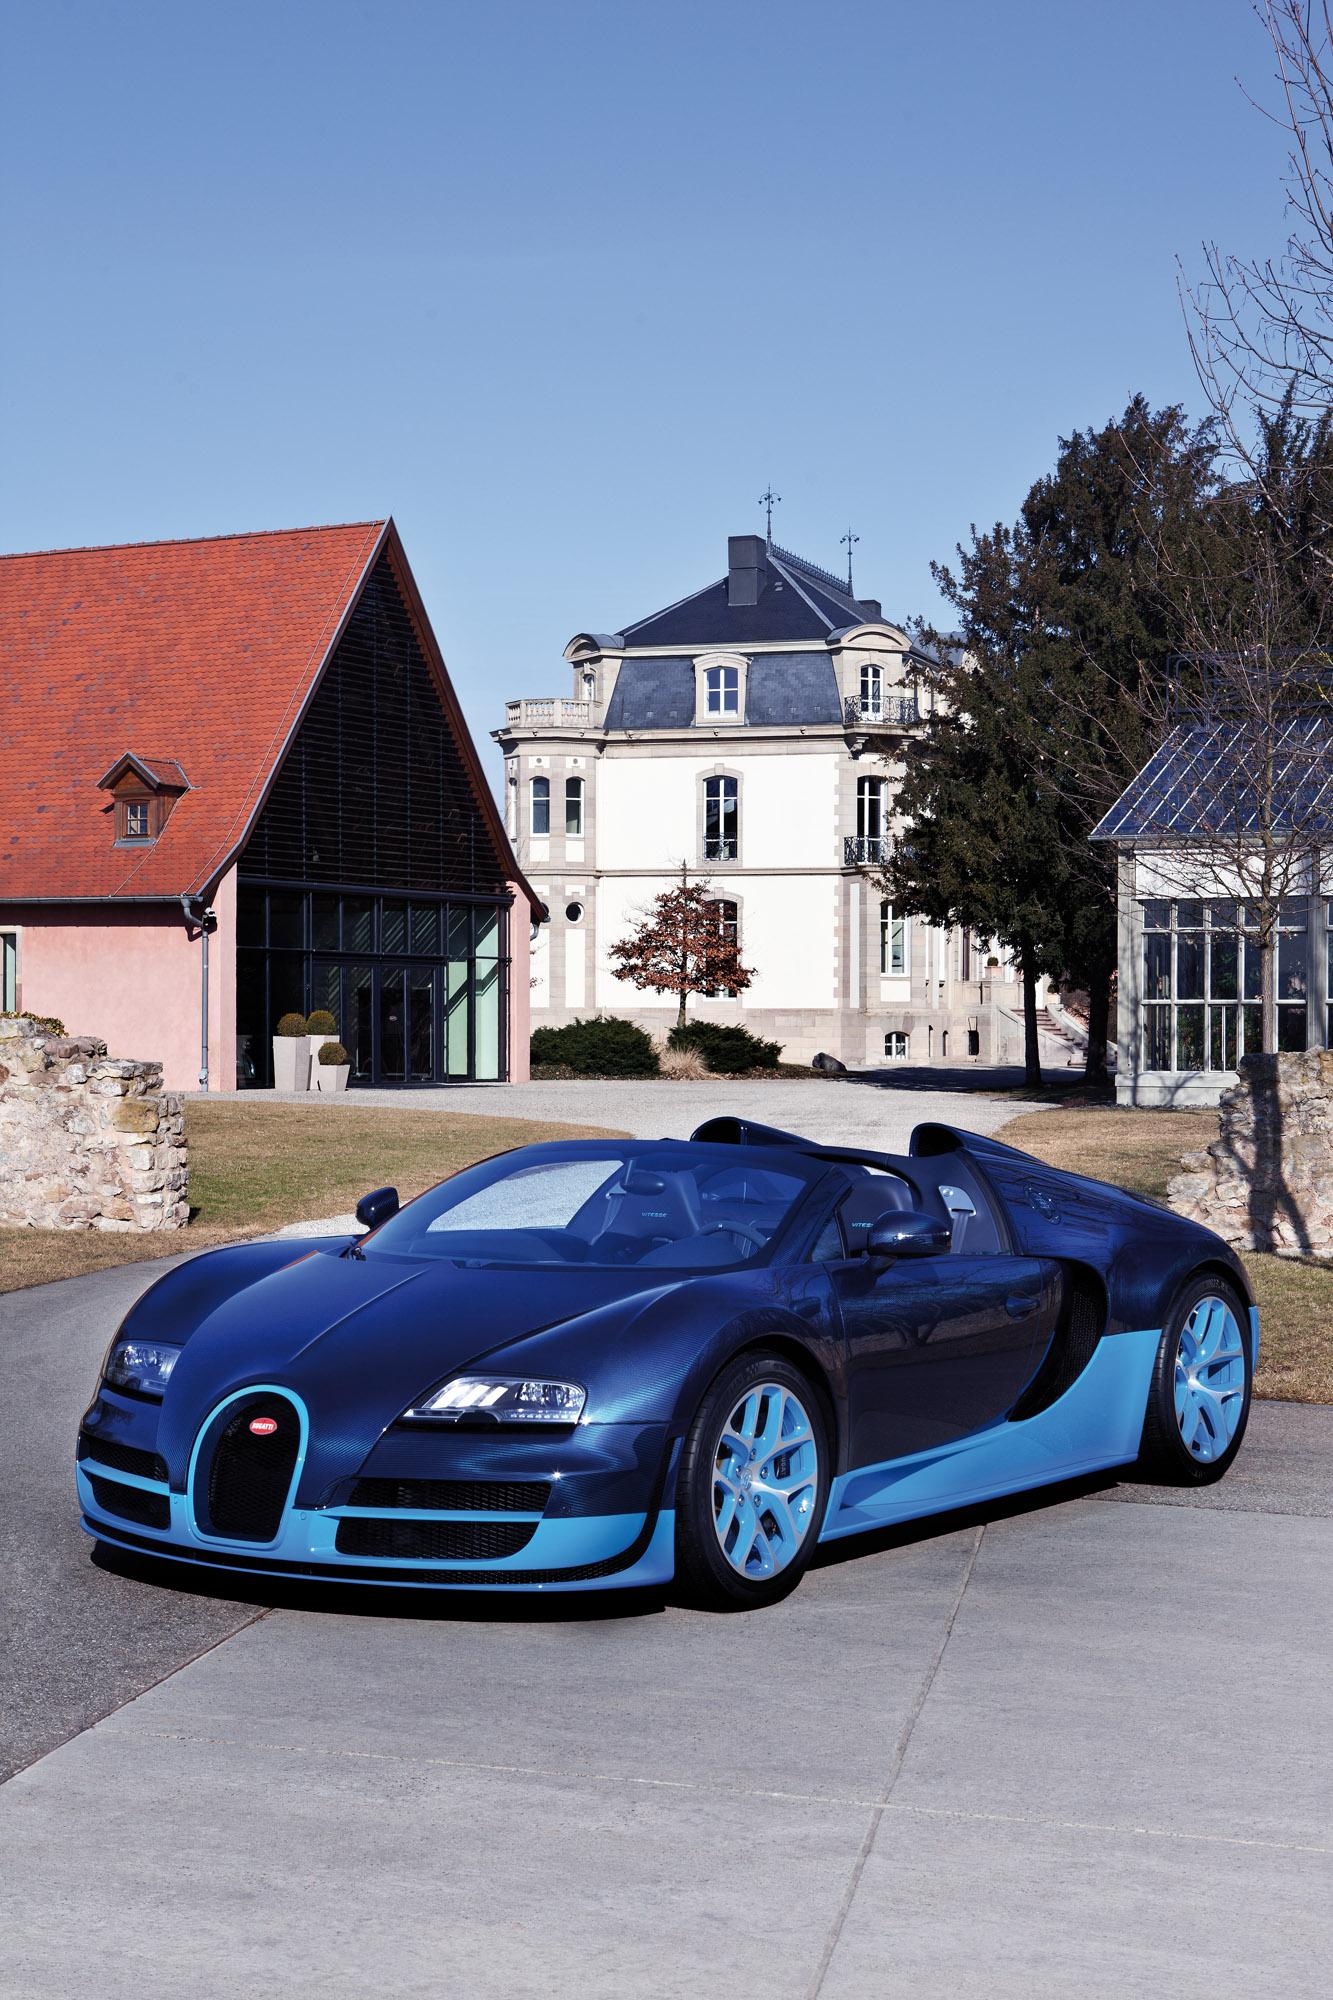 2012-bugatti-veyron-grand-sport-vitesse-blue-carbon-01 Amazing Bugatti Veyron Grand Sport Vitesse Information Cars Trend